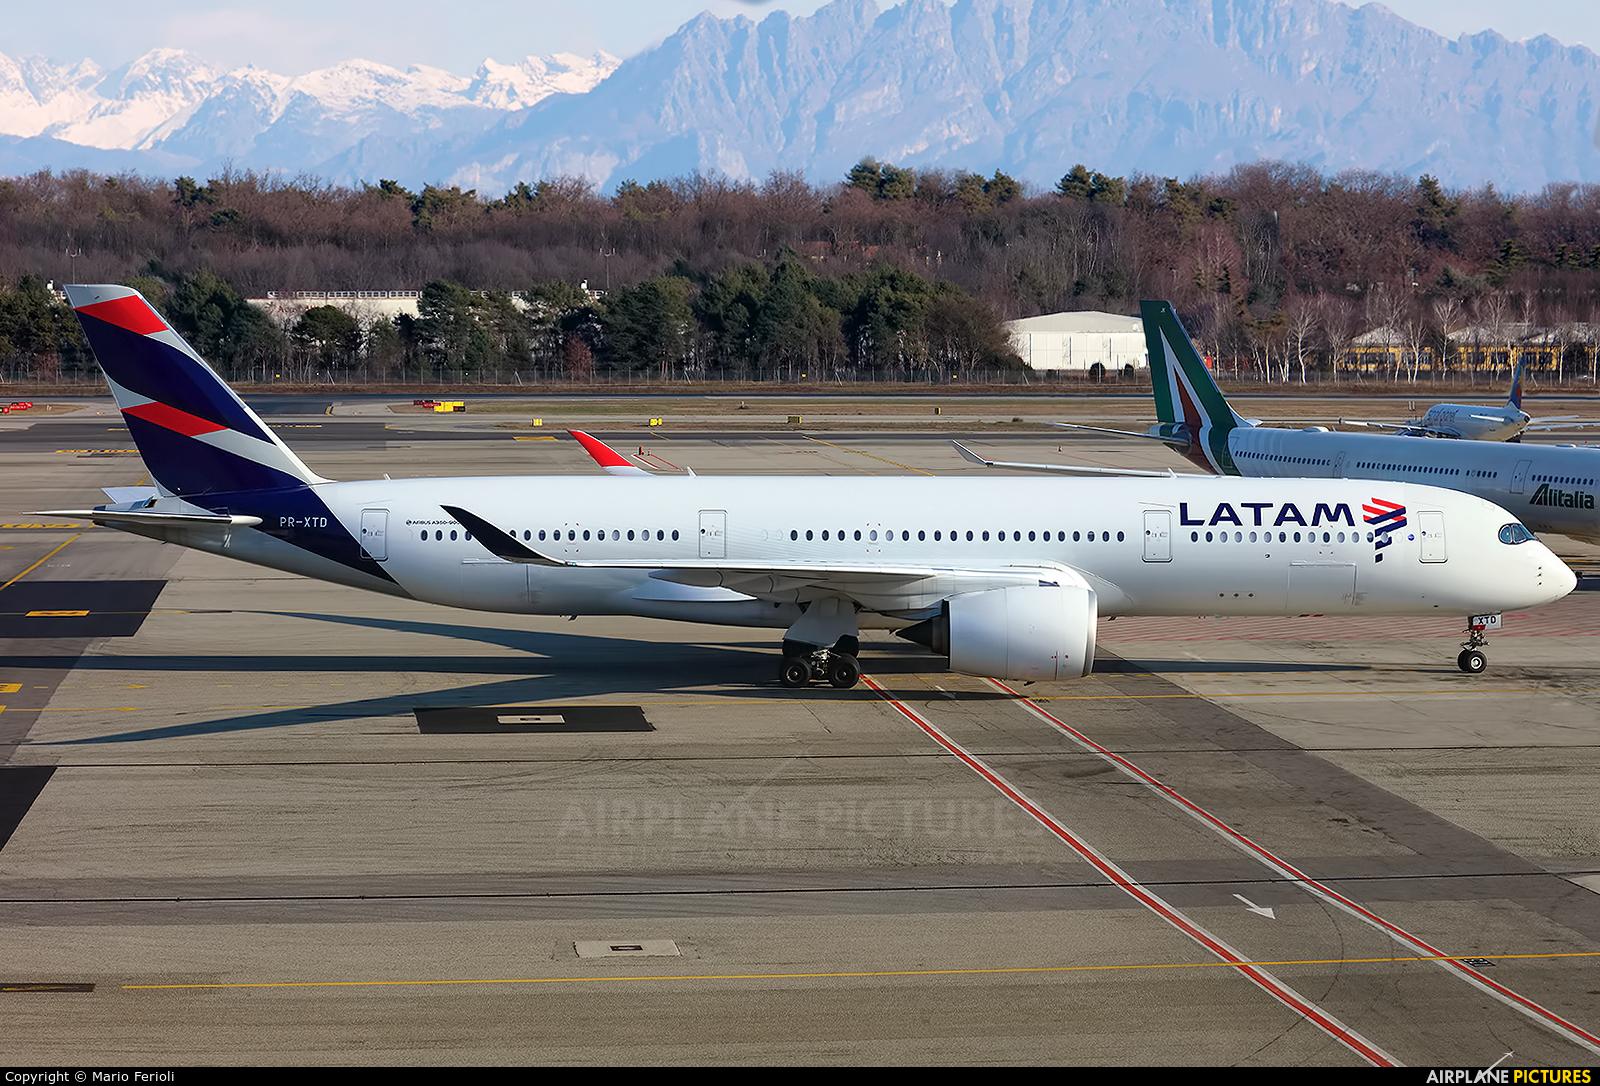 LATAM PR-XTD aircraft at Milan - Malpensa